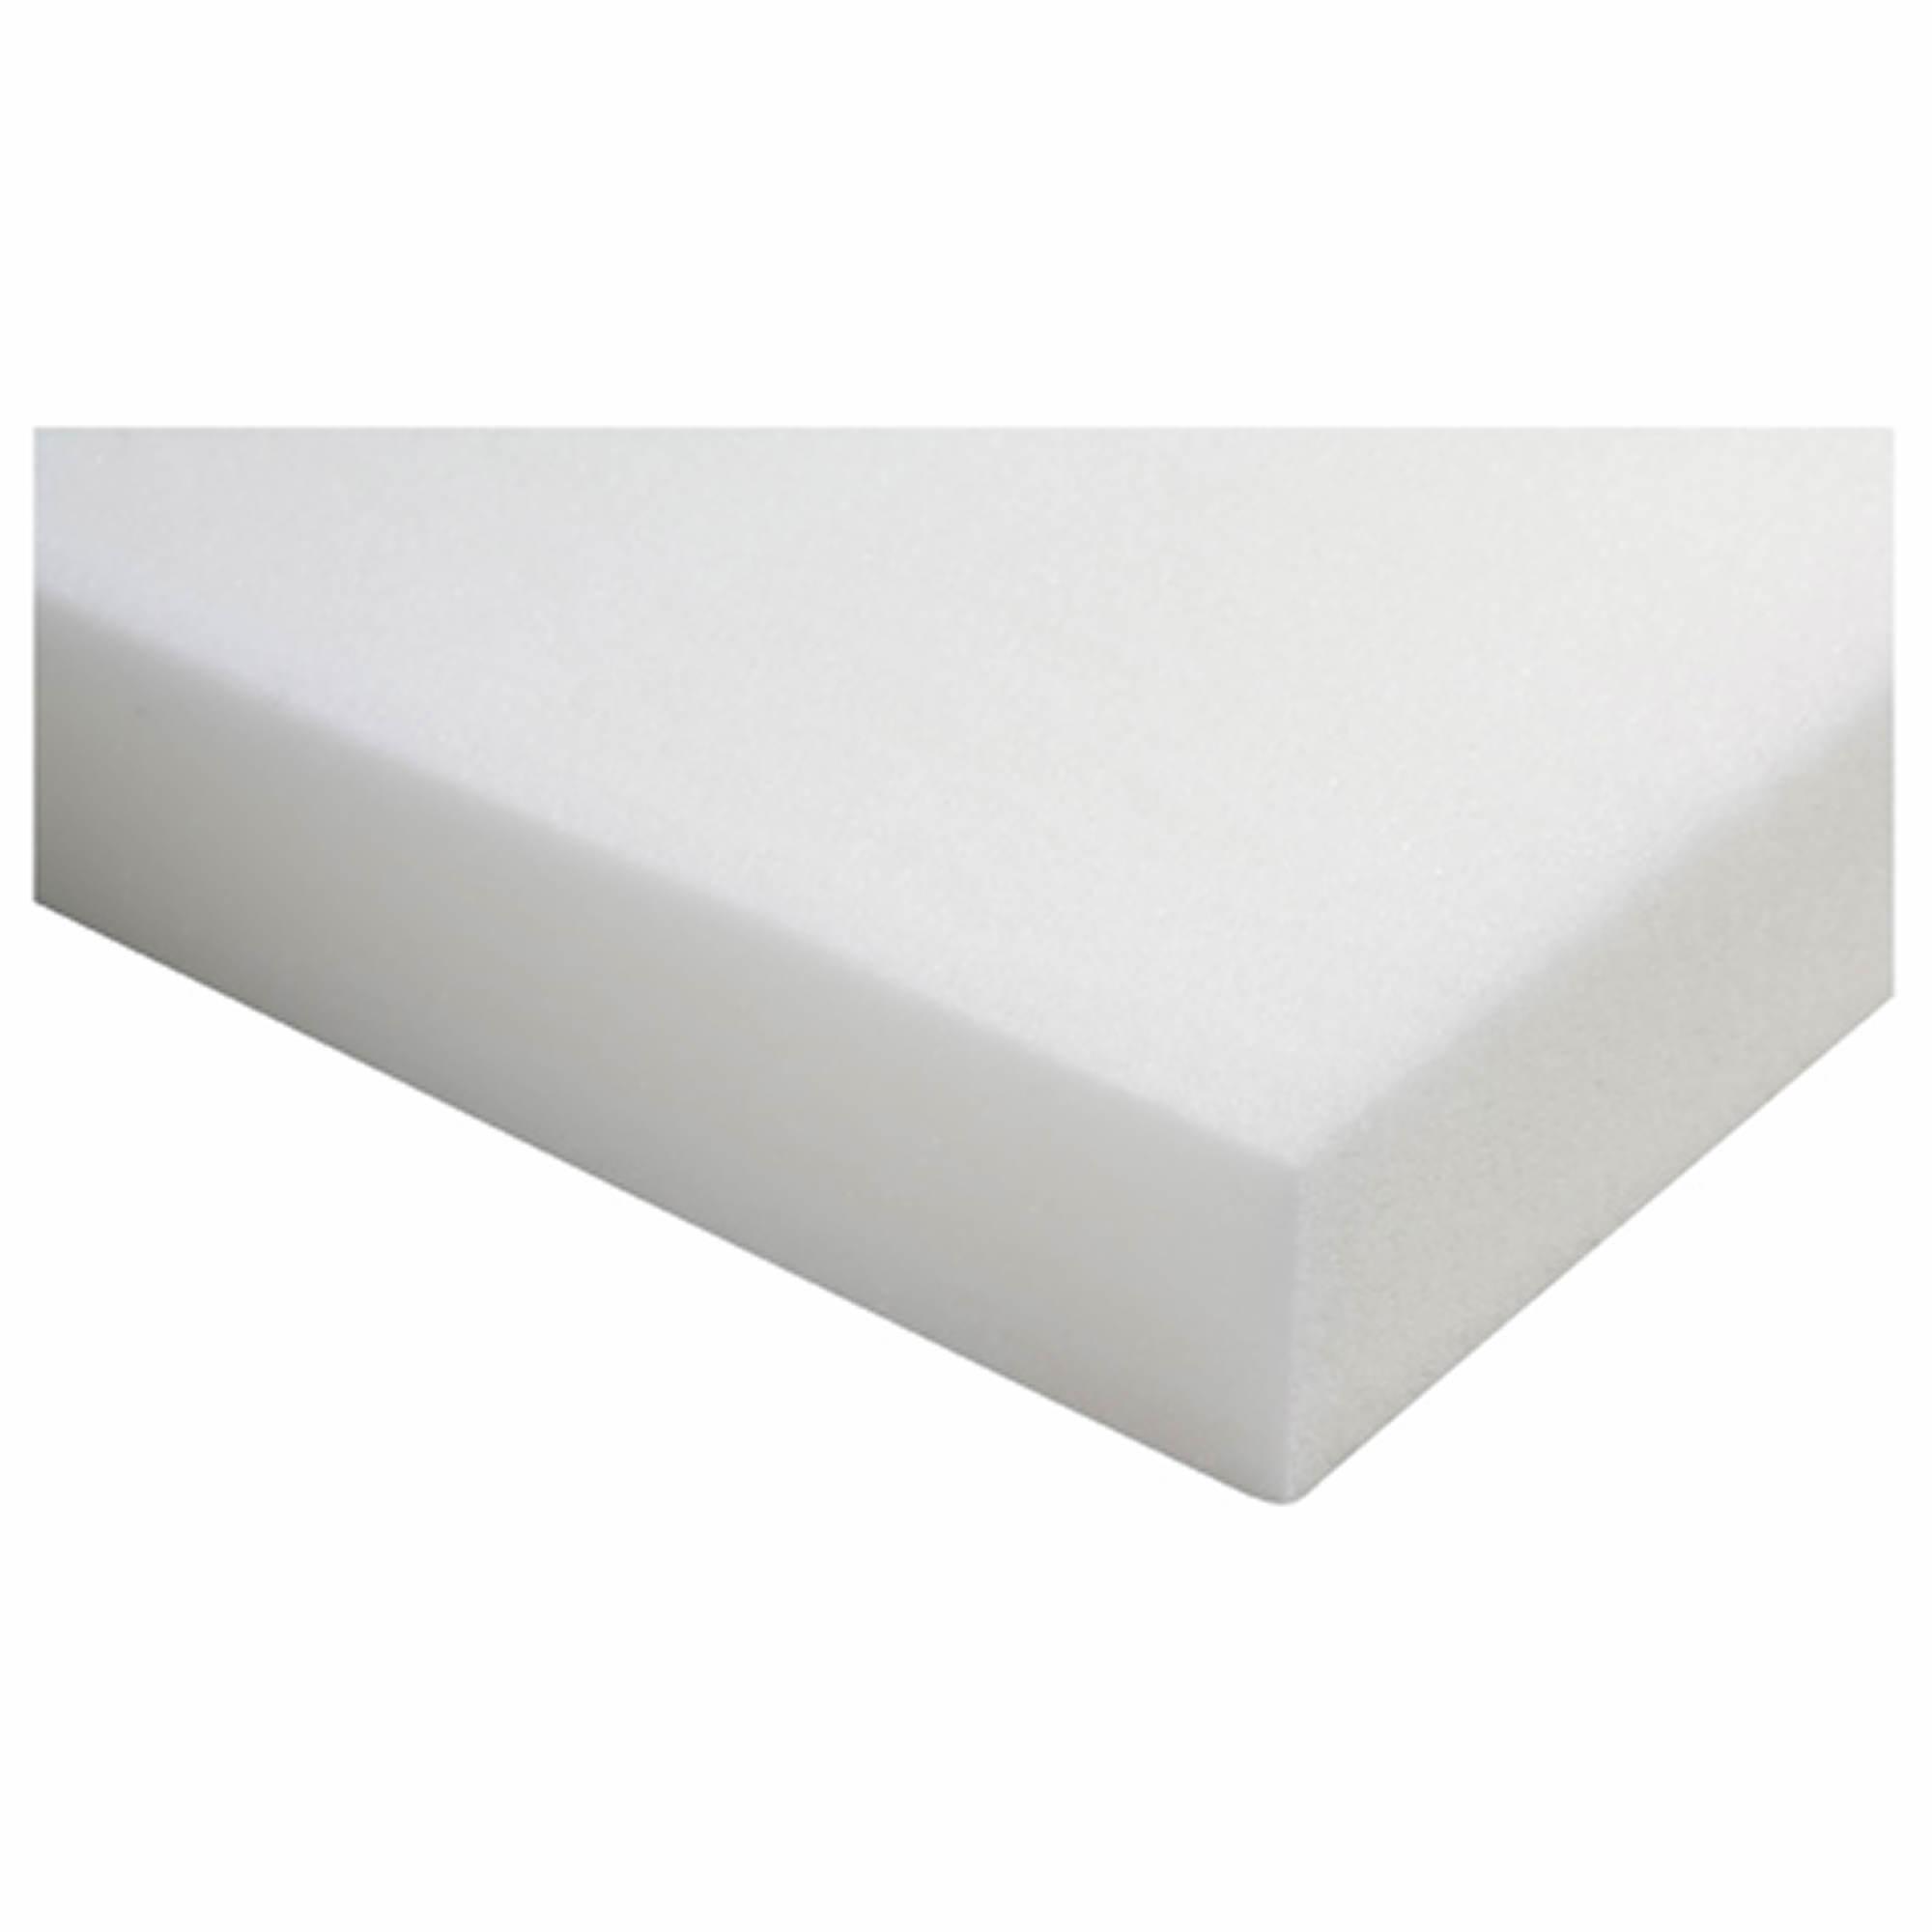 cradlesoft university 1 1 2 memory foam mattress topper twin xl bj 39 s wholesale club. Black Bedroom Furniture Sets. Home Design Ideas